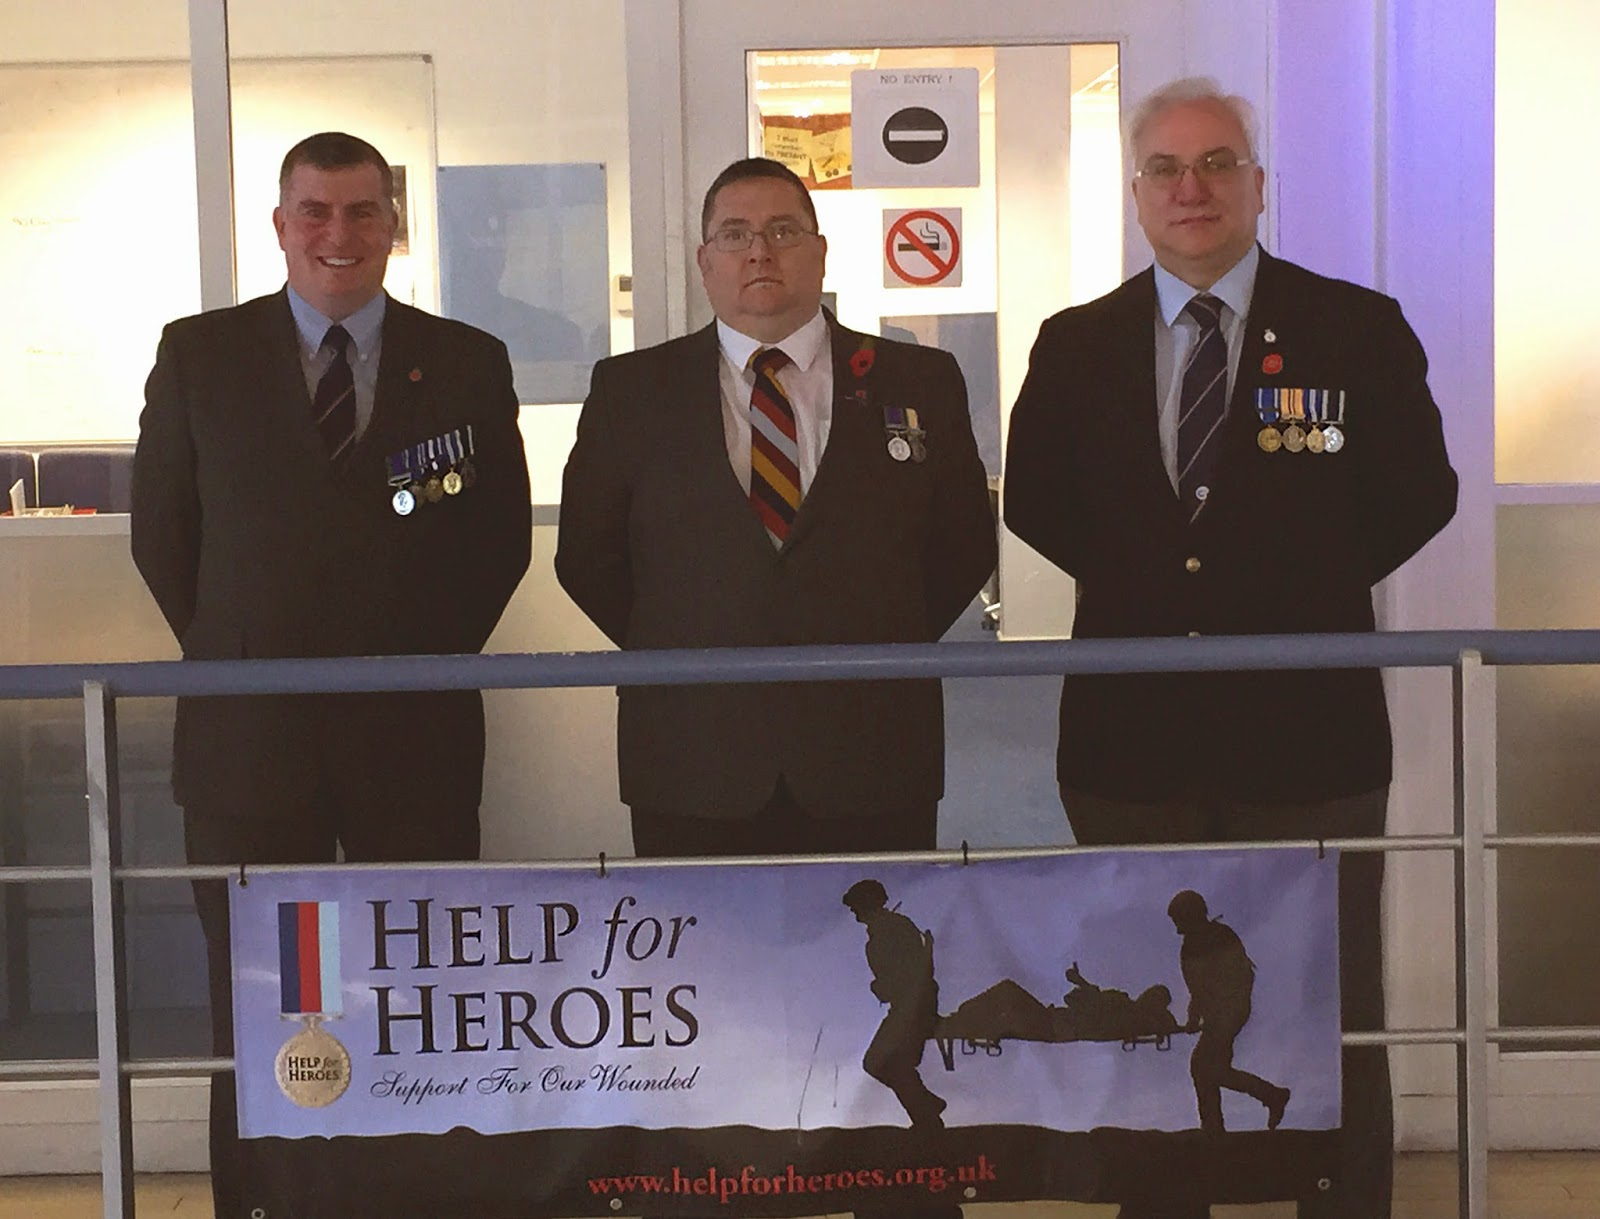 WW1 Centerprise Staff Wear Medals for Centennial in the Atrium, Basingstoke